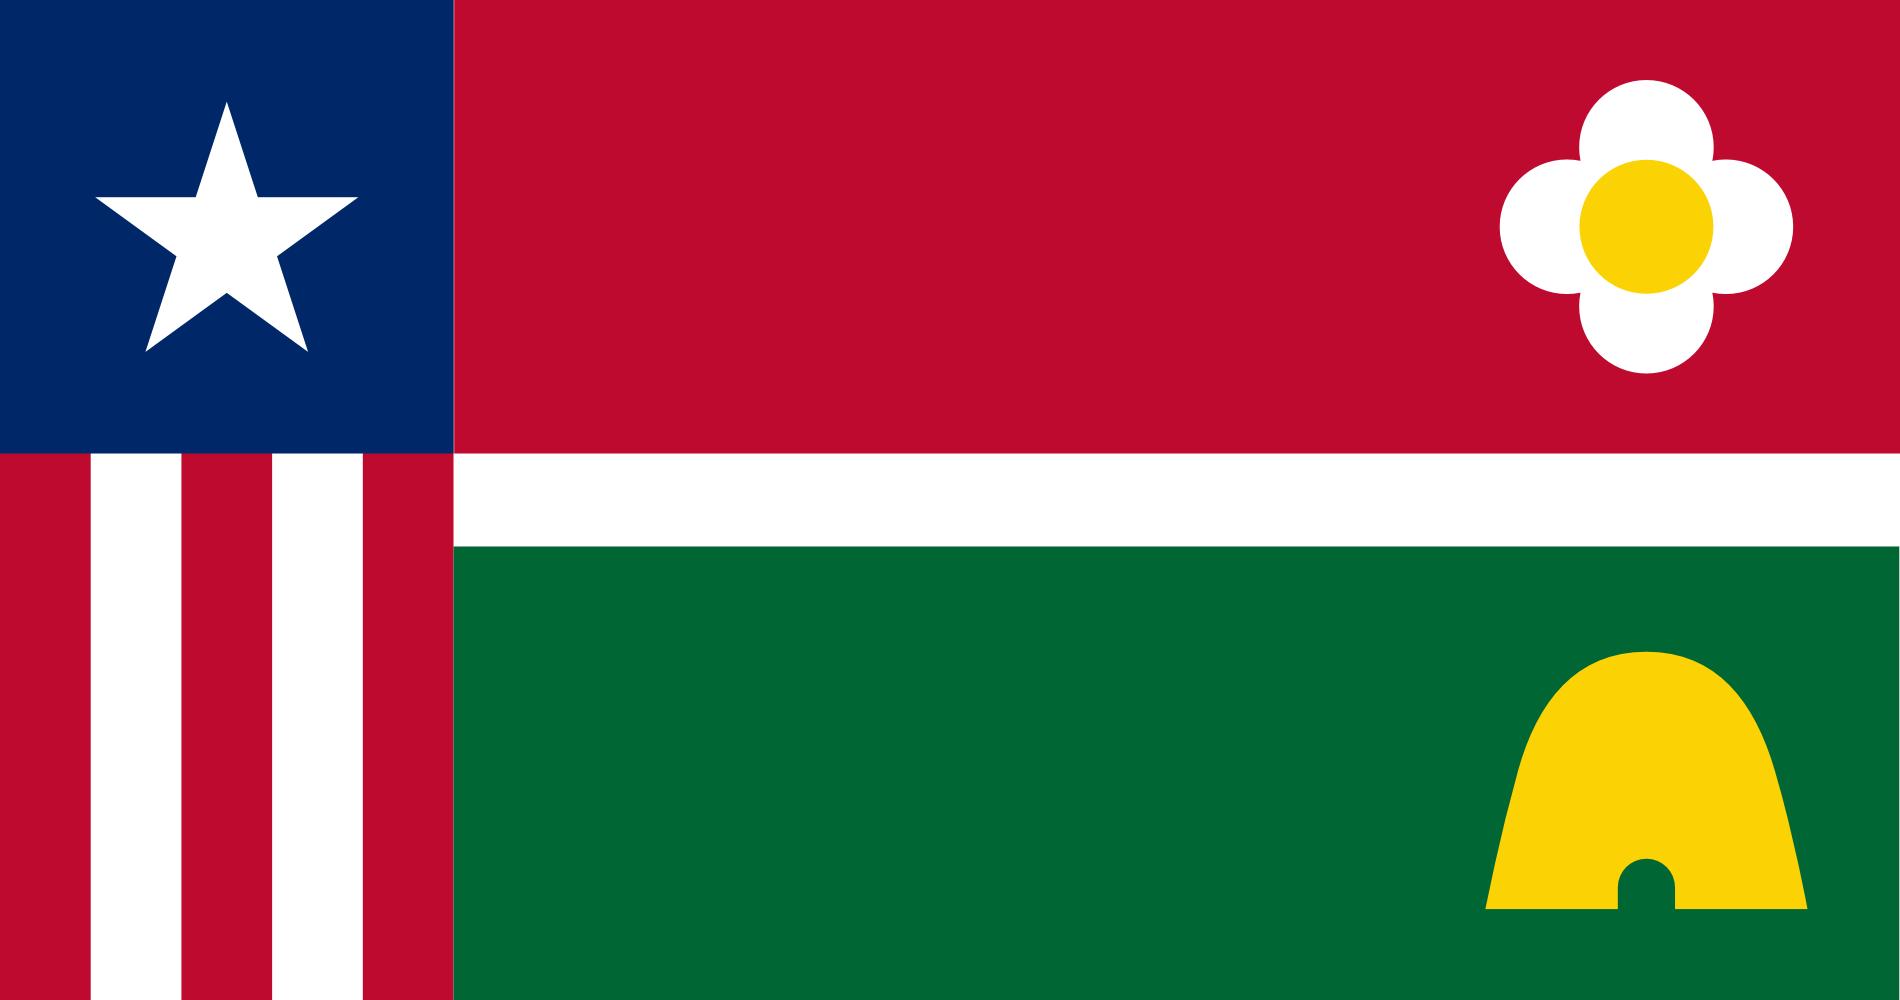 Margibi County